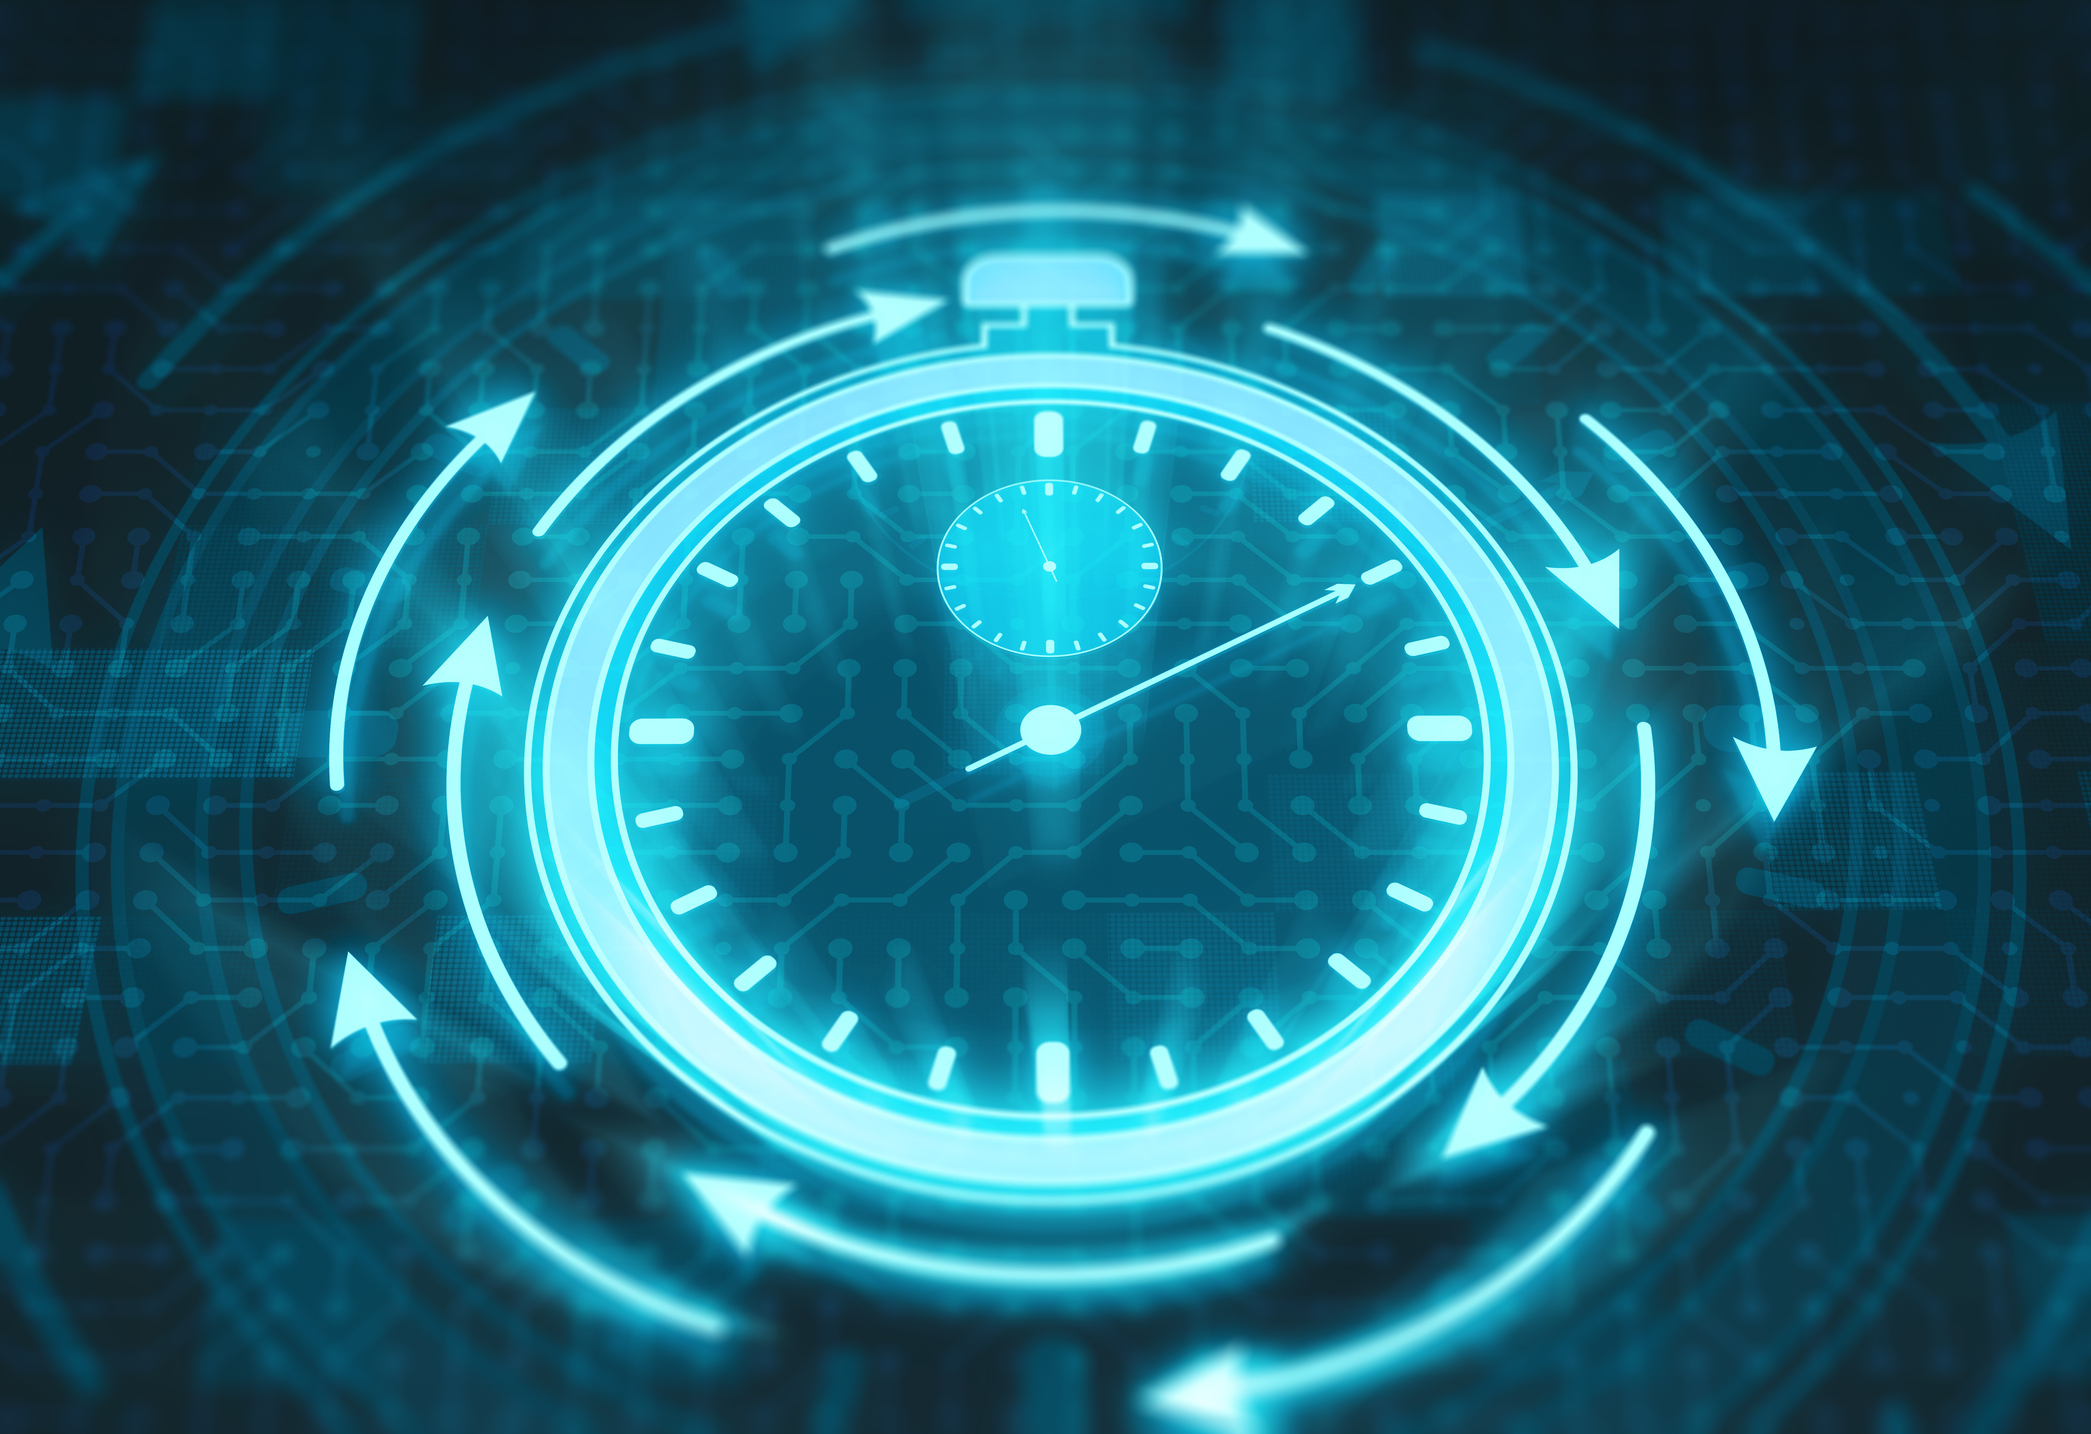 speed read, clock, watch